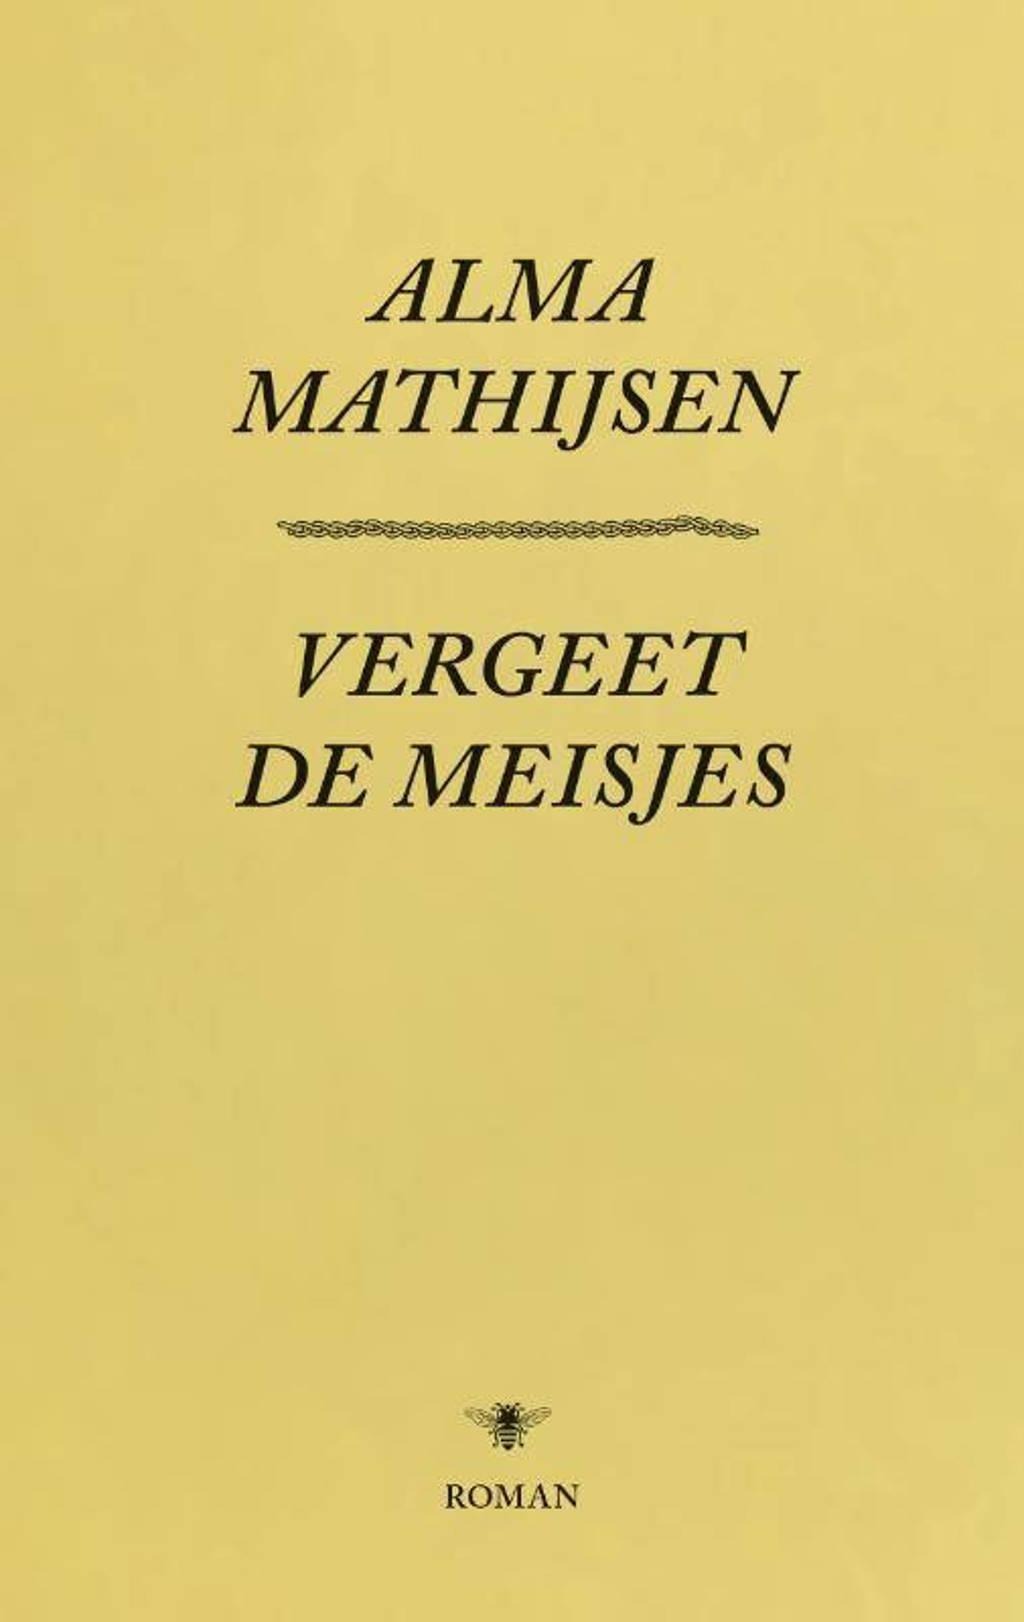 Vergeet de meisjes - Alma Mathijsen